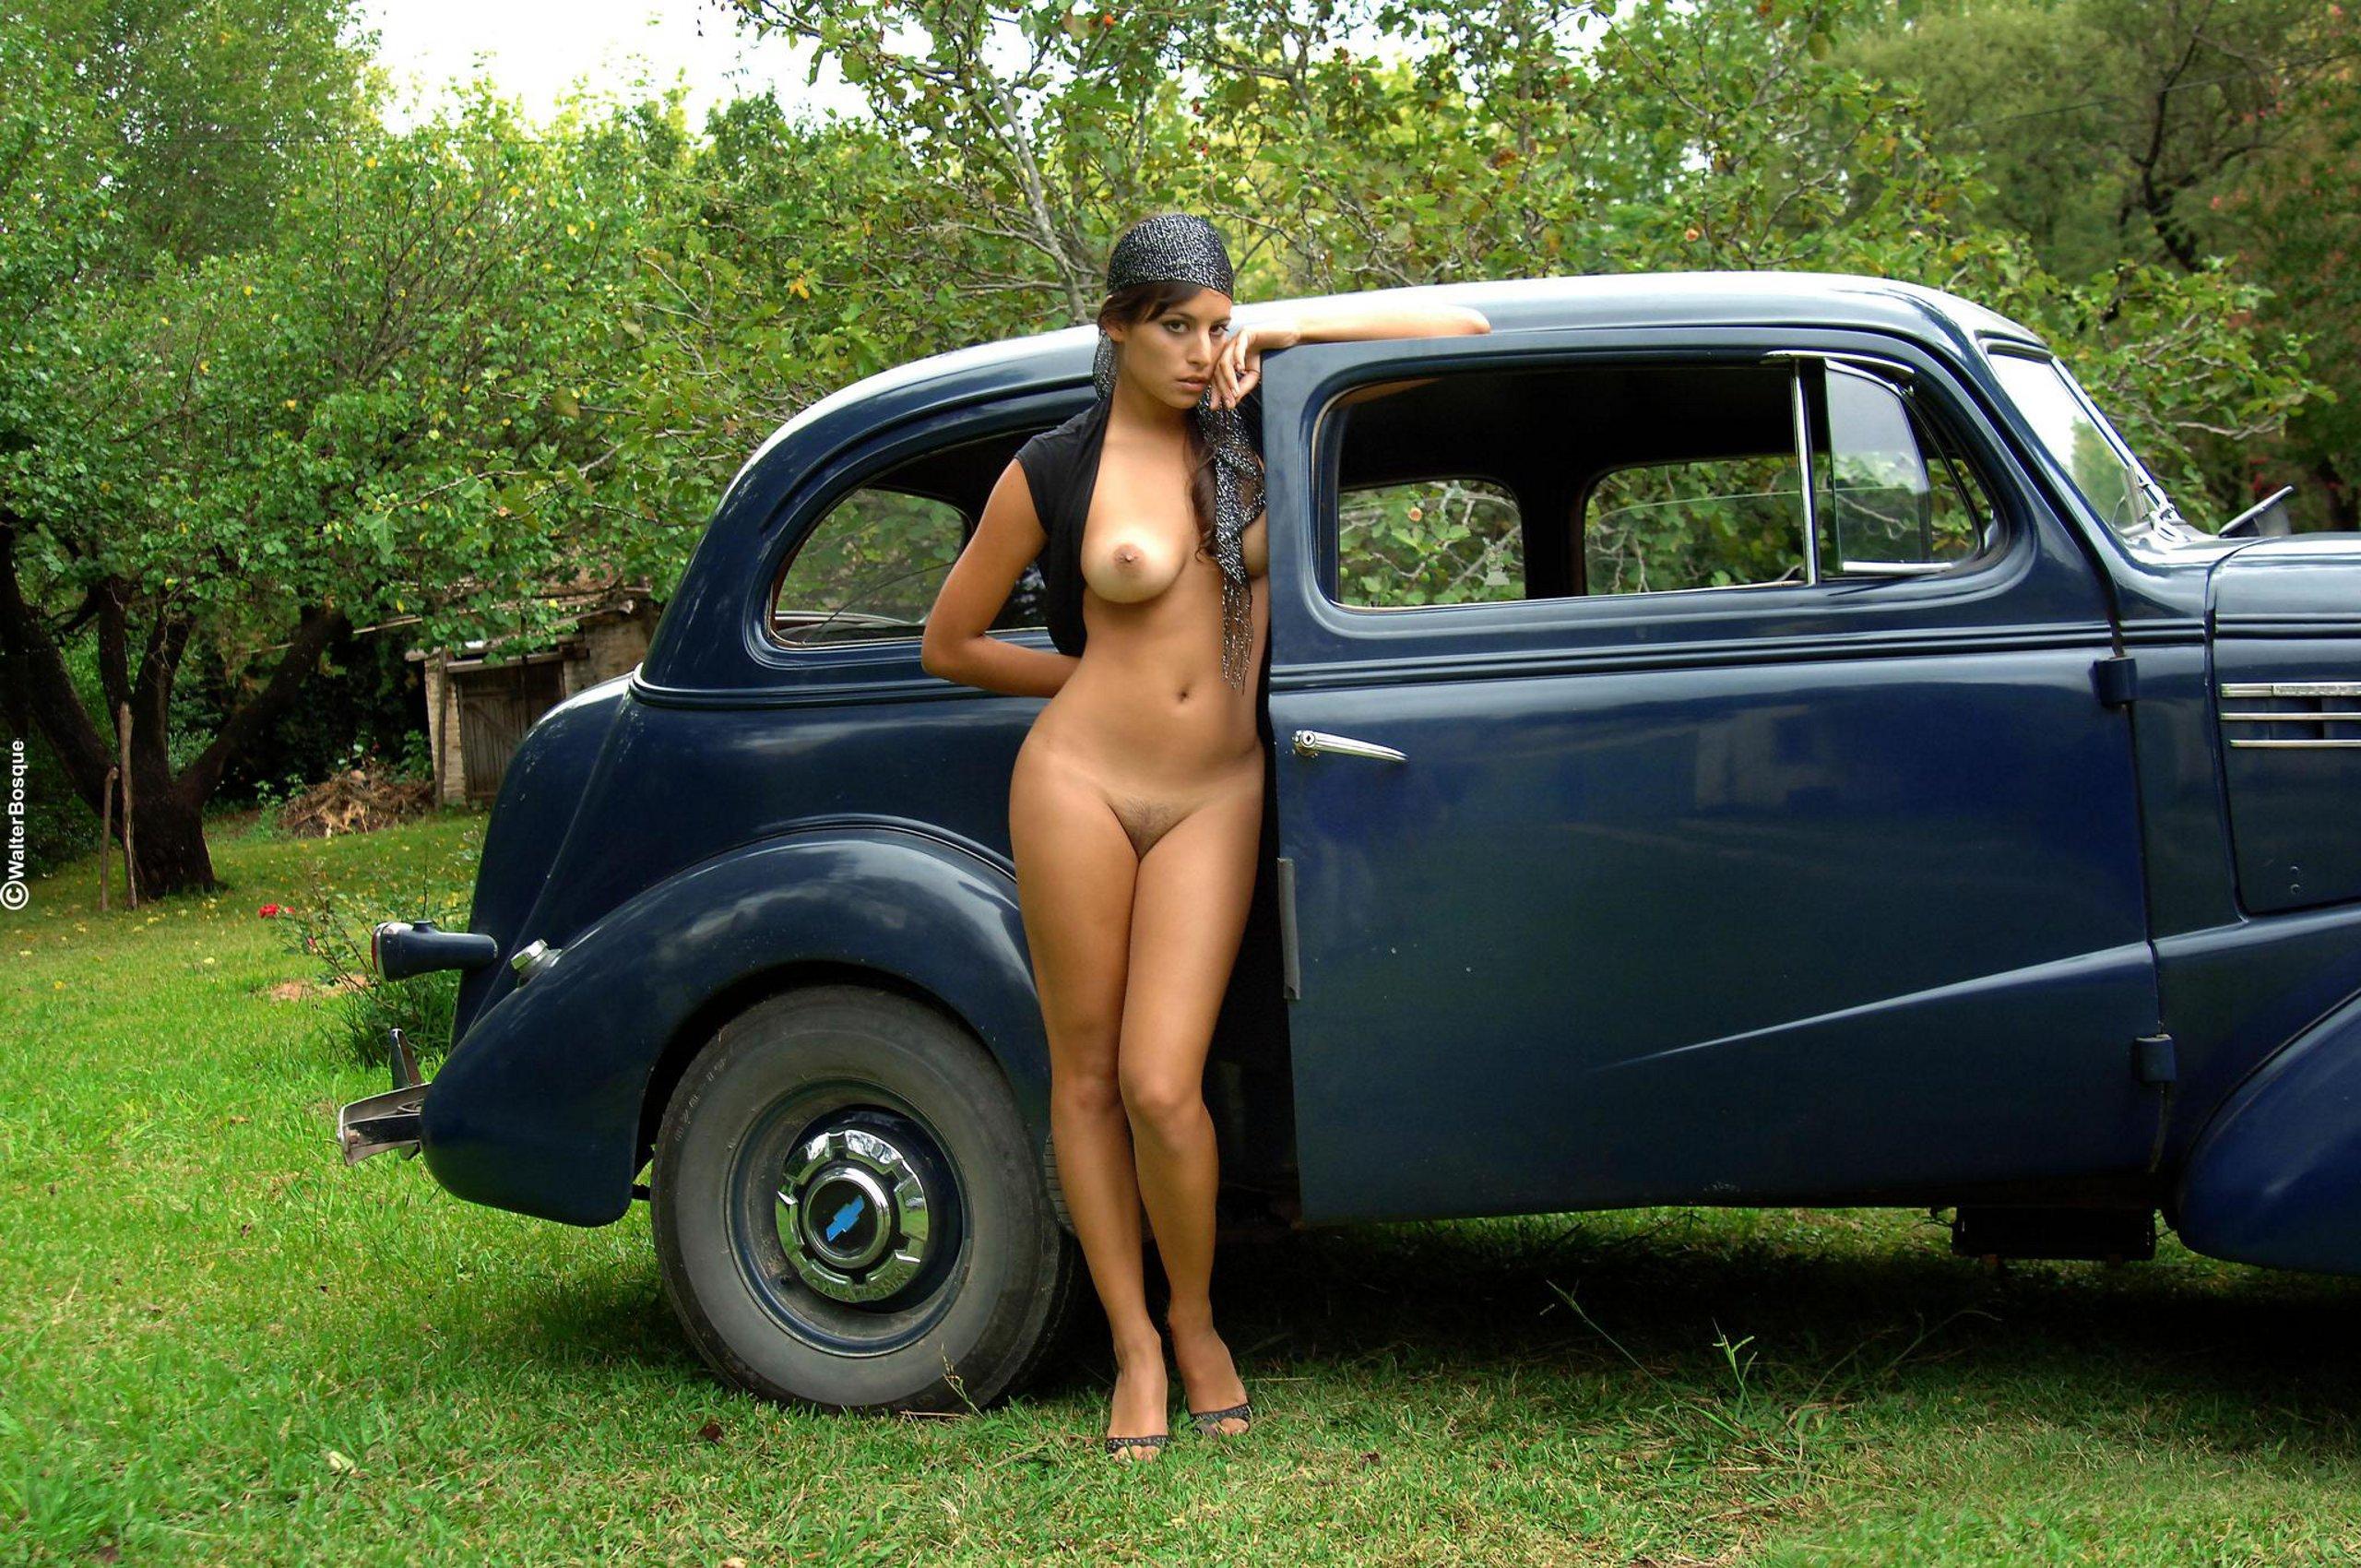 Photo girls school hidden camera naked